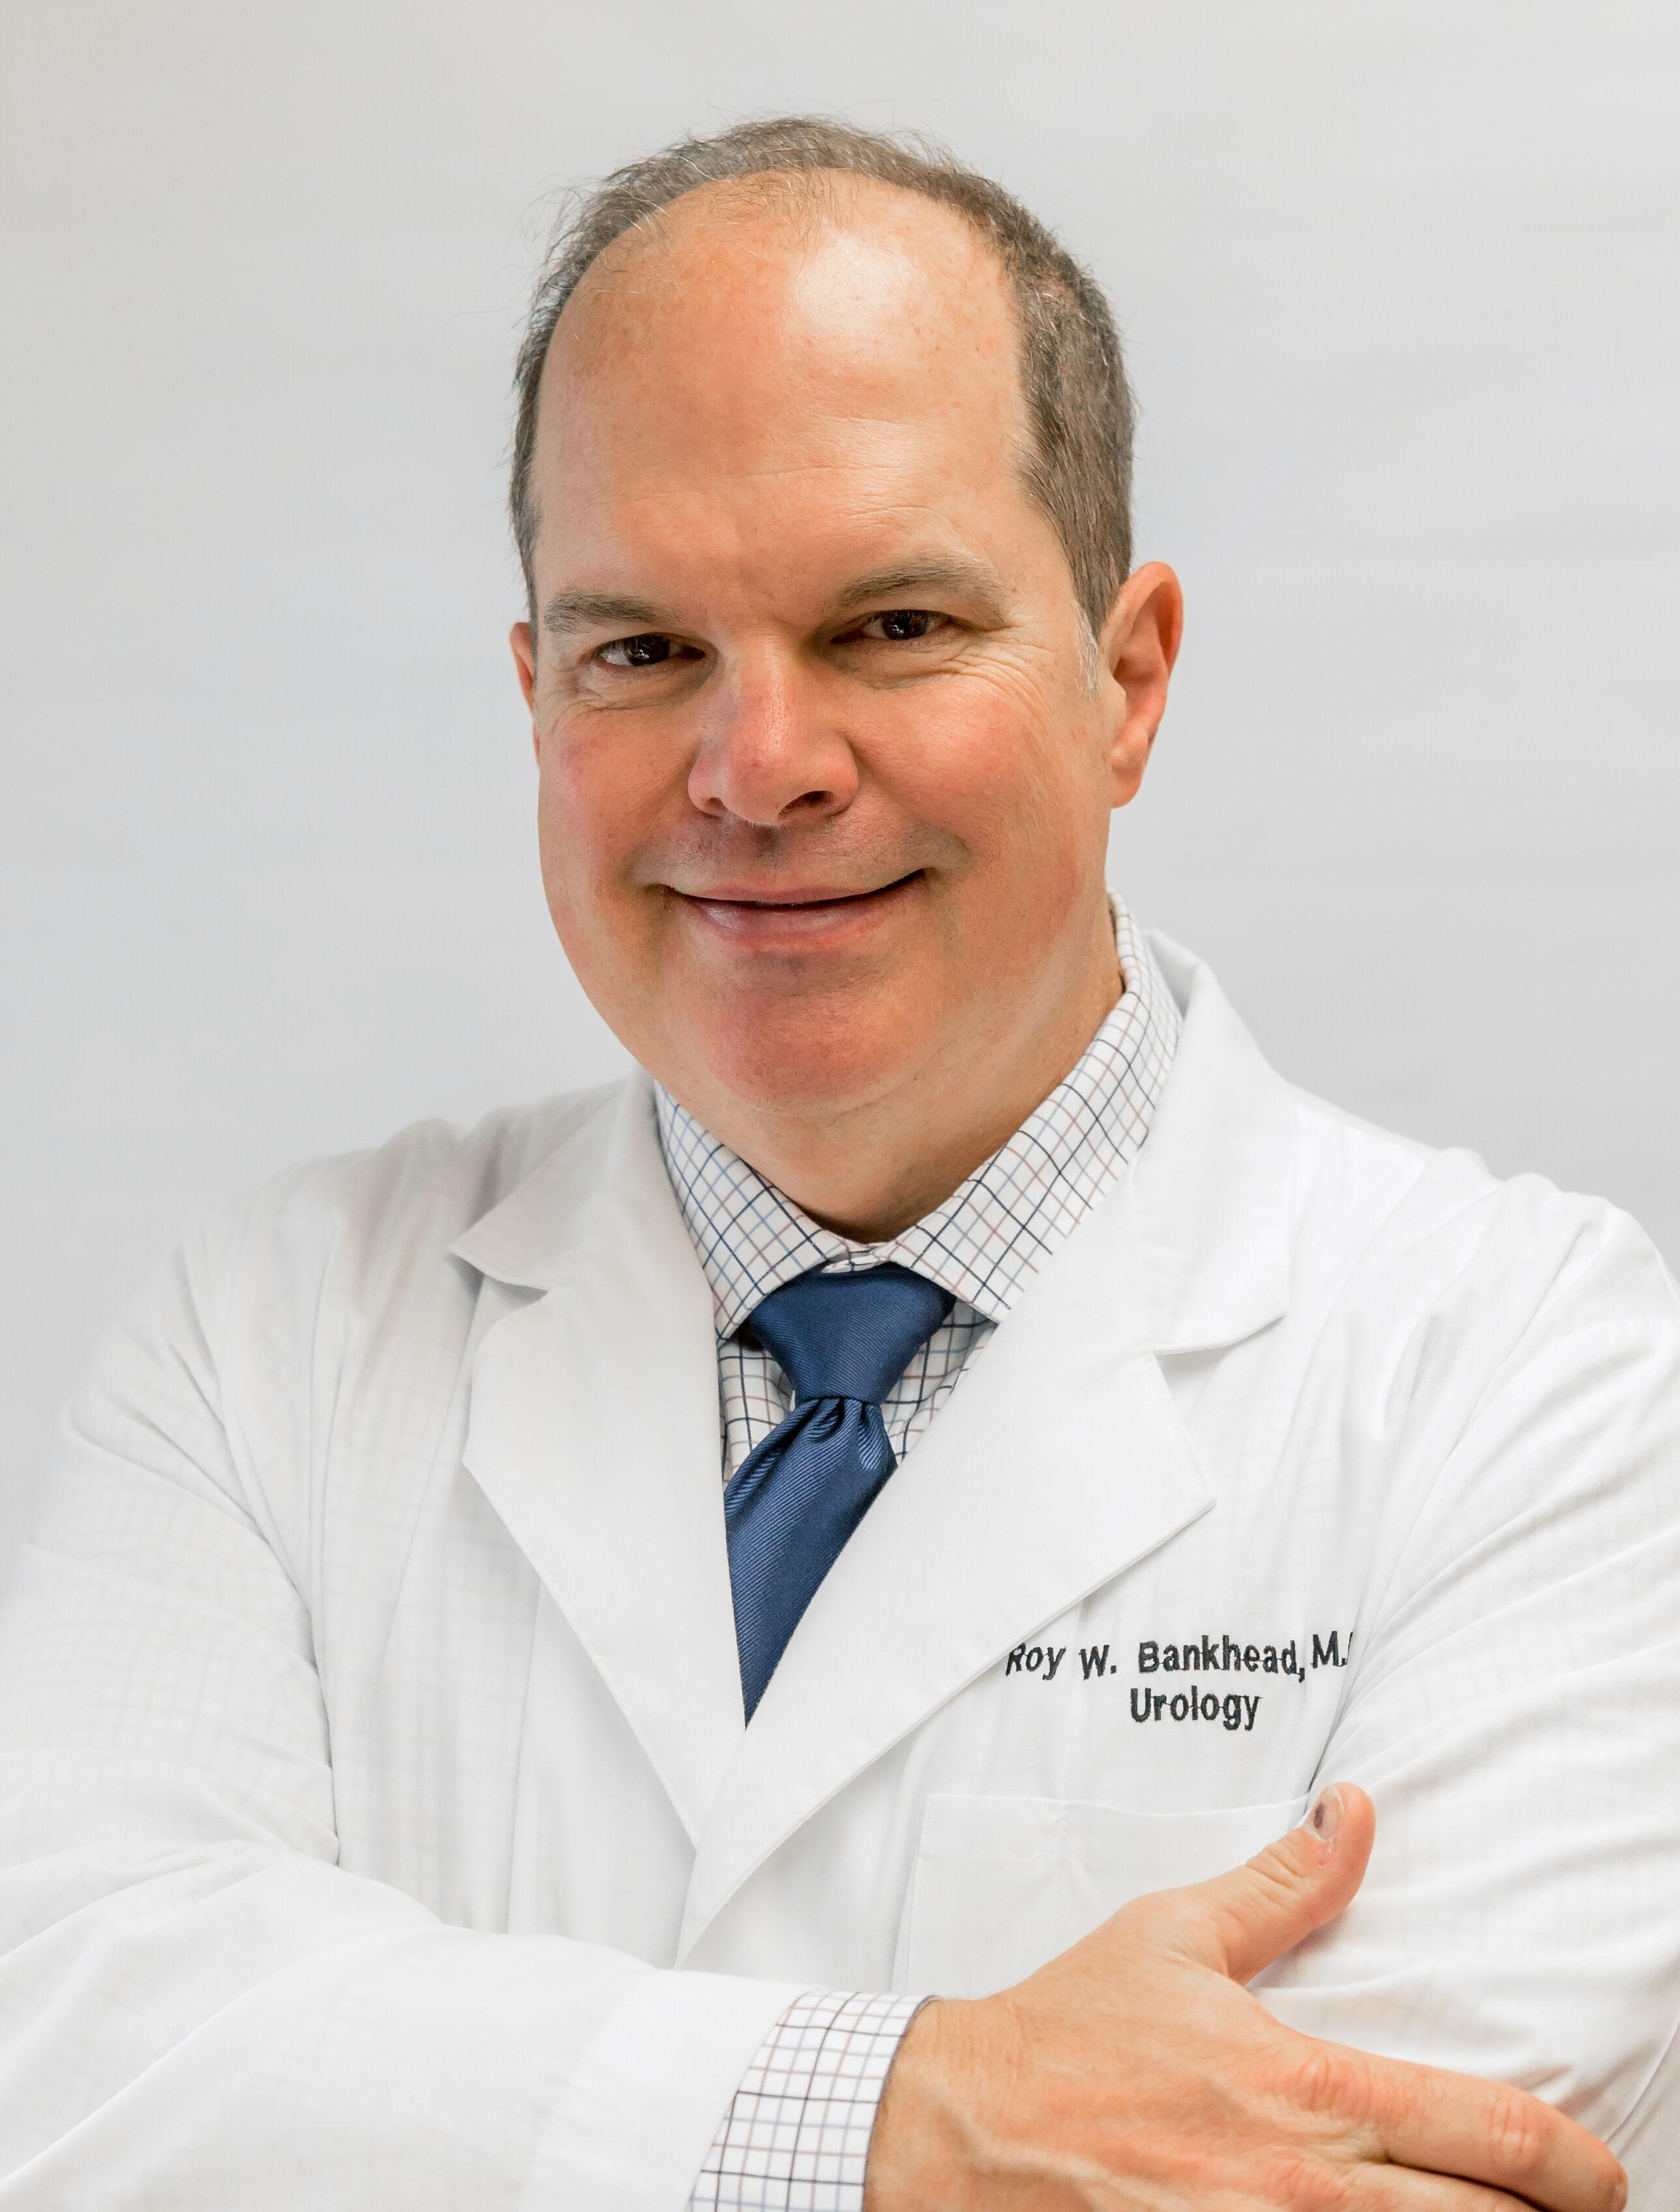 Dr. Roy Bankhead Oklahoma City Urologist